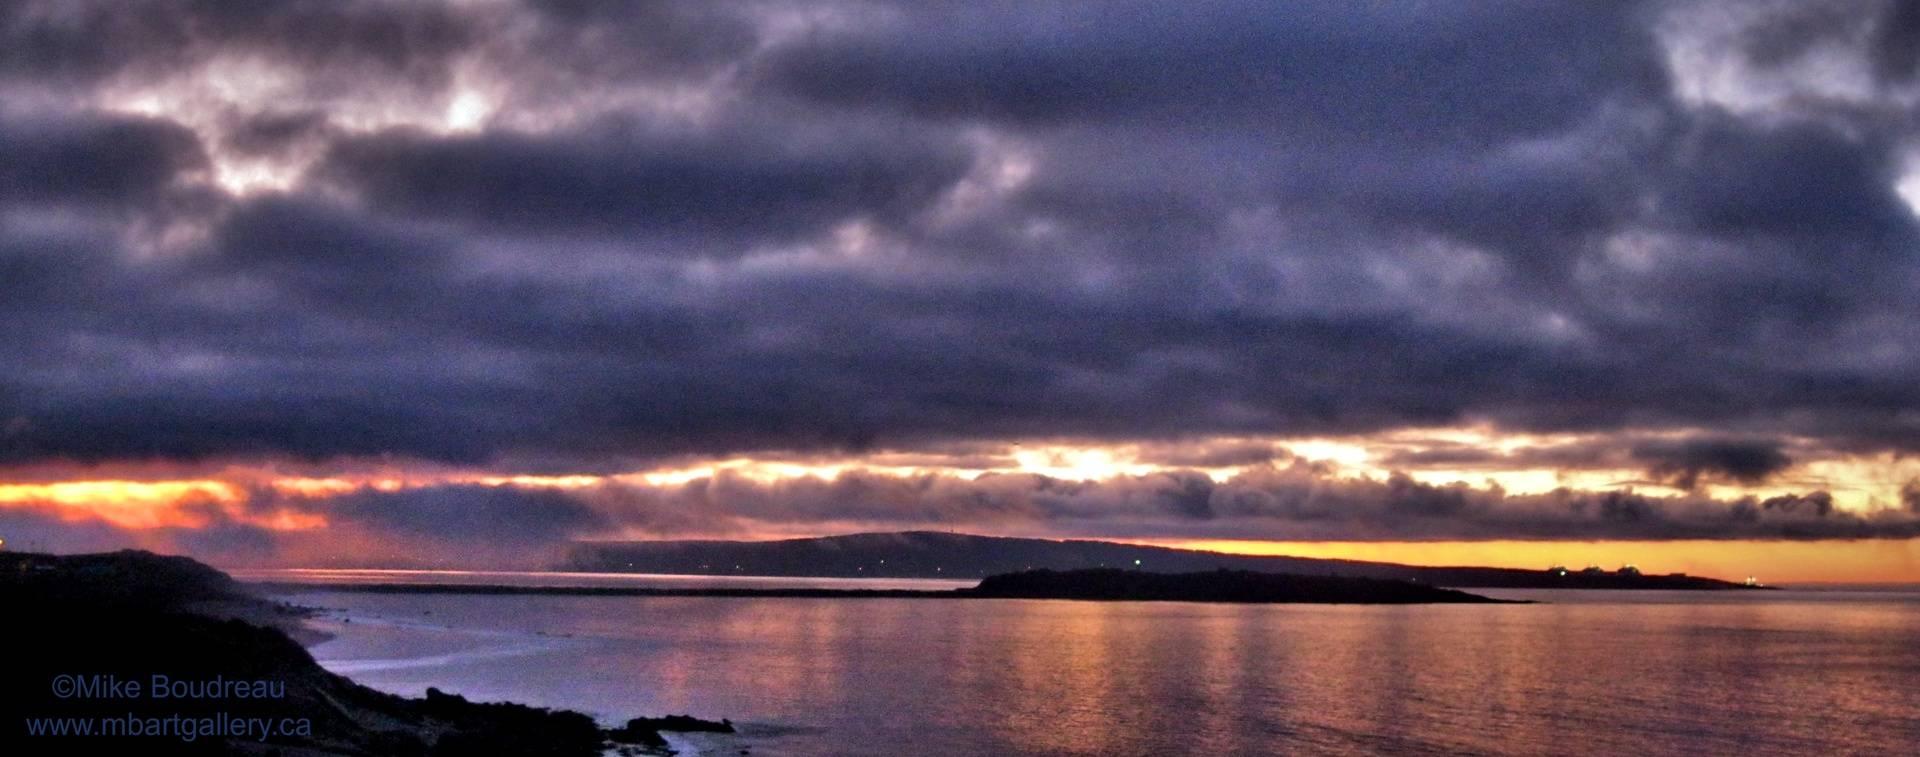 Partridge Island, Saint John NB